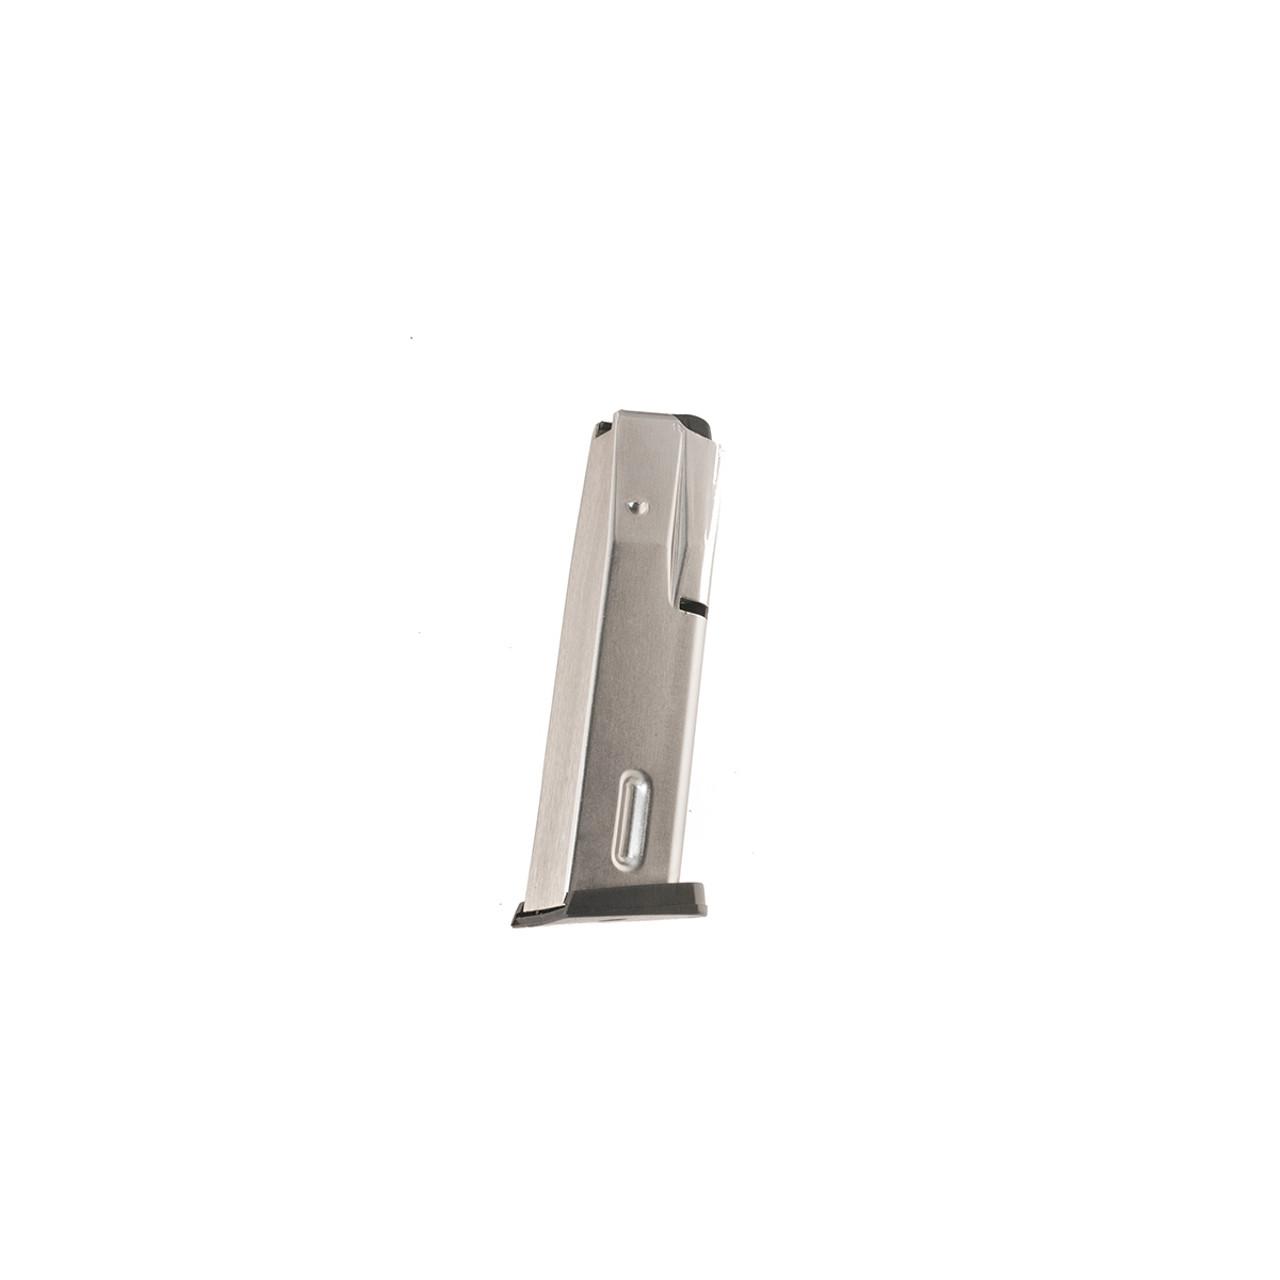 Beretta® 84 .380 ACP (13) Rd - Nickel Plated Steel